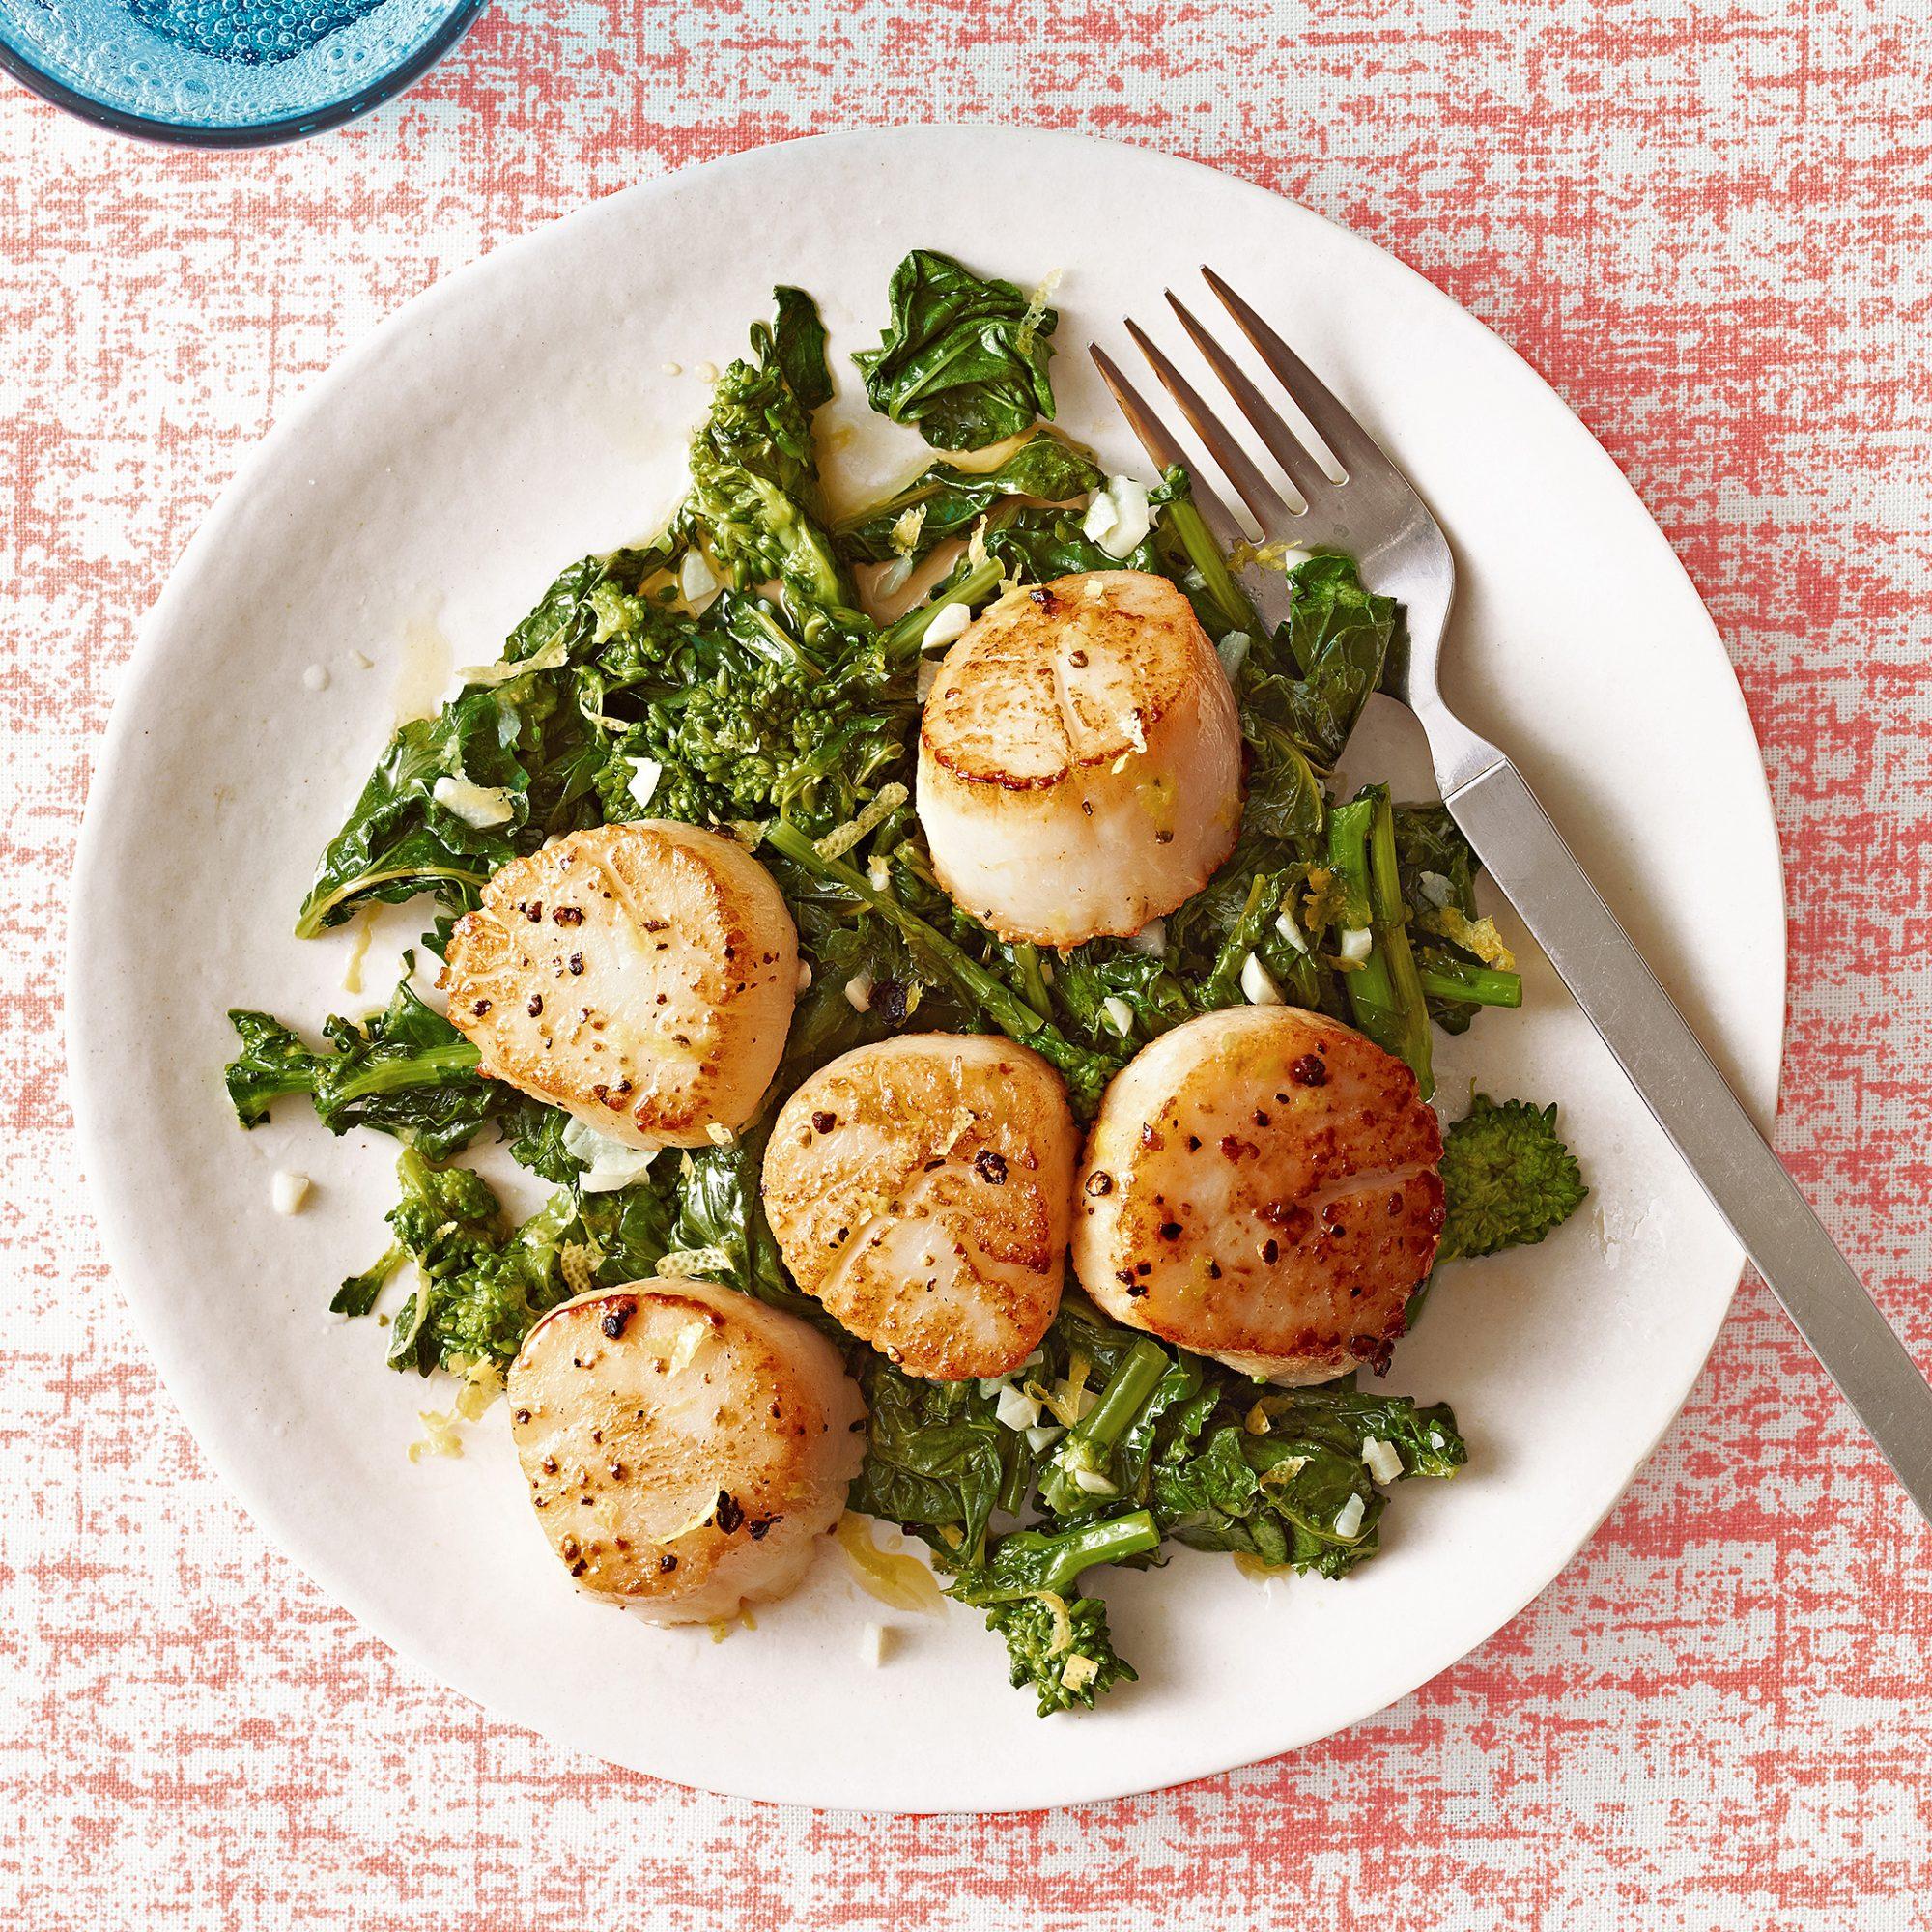 Scallops with Lemony Broccoli Rabe